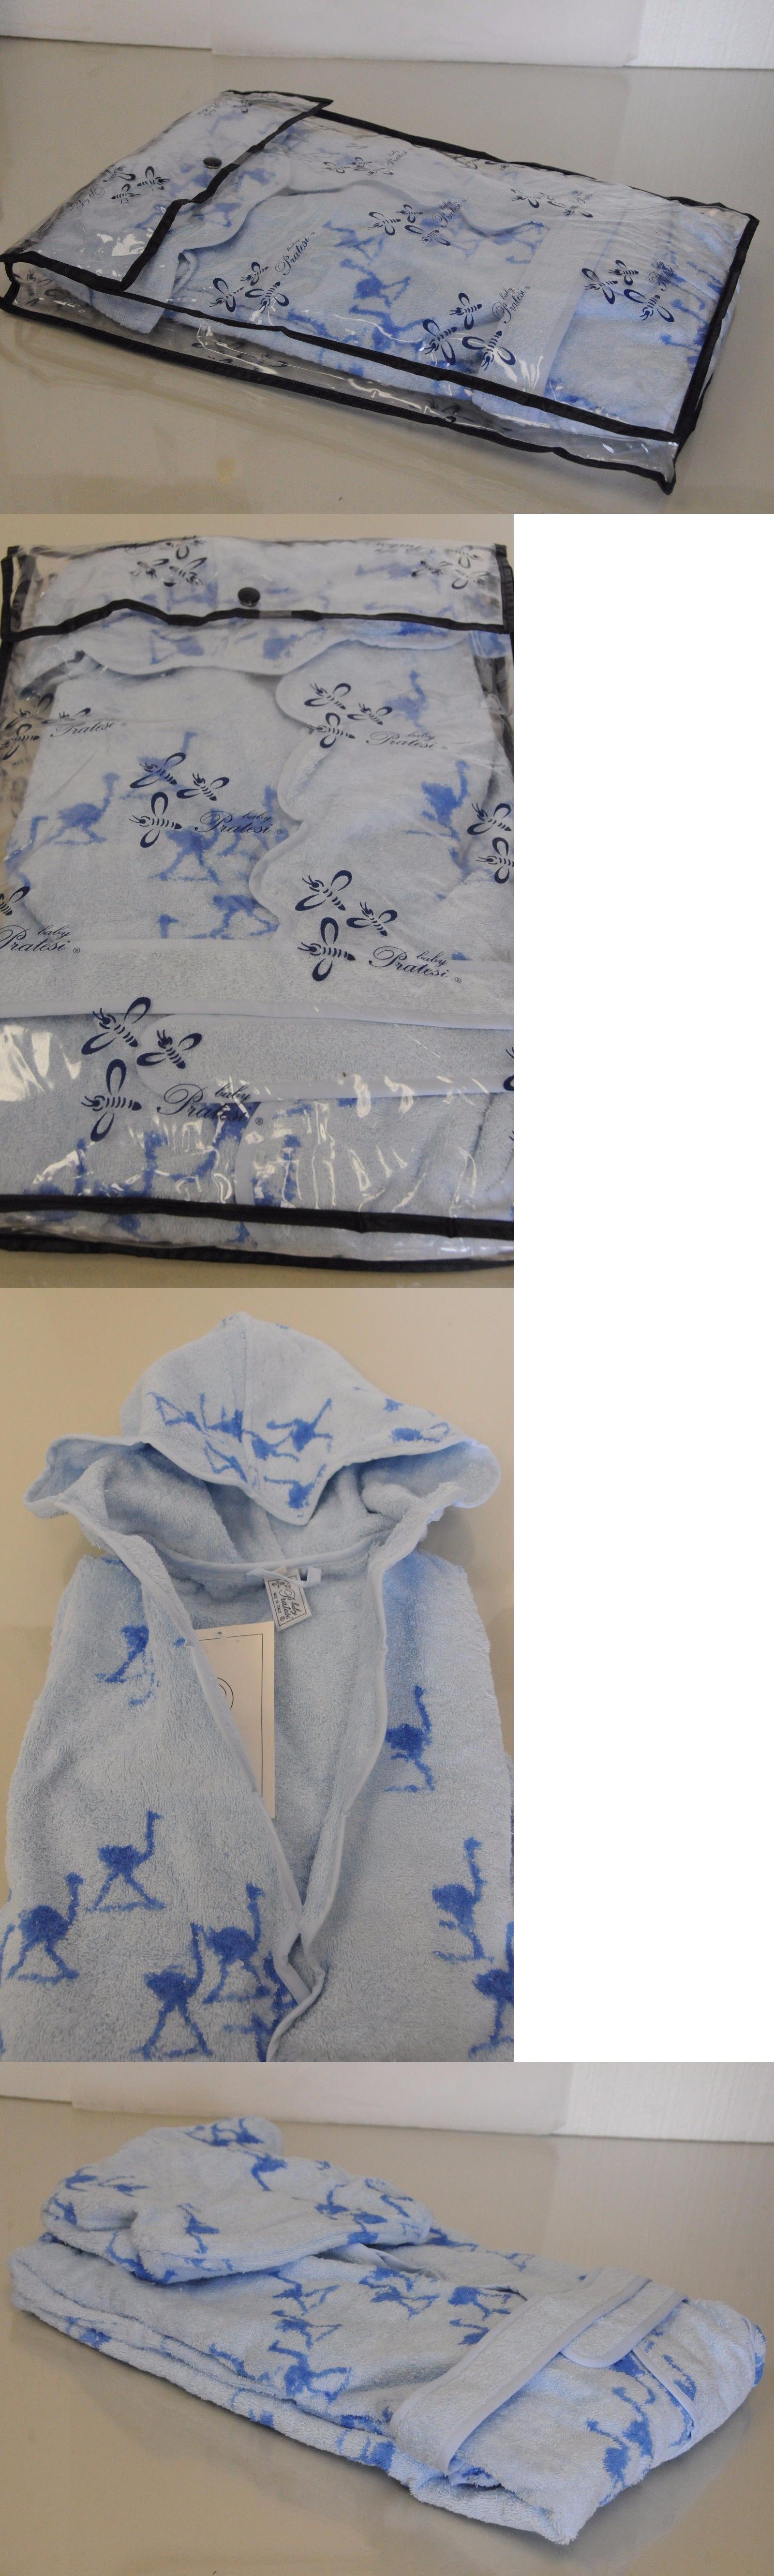 Sleepwear 99735   530 New Blue Baby Pratesi Scalloped Terry Bath Girls Robe  Exquisite! Size a39f3eaad